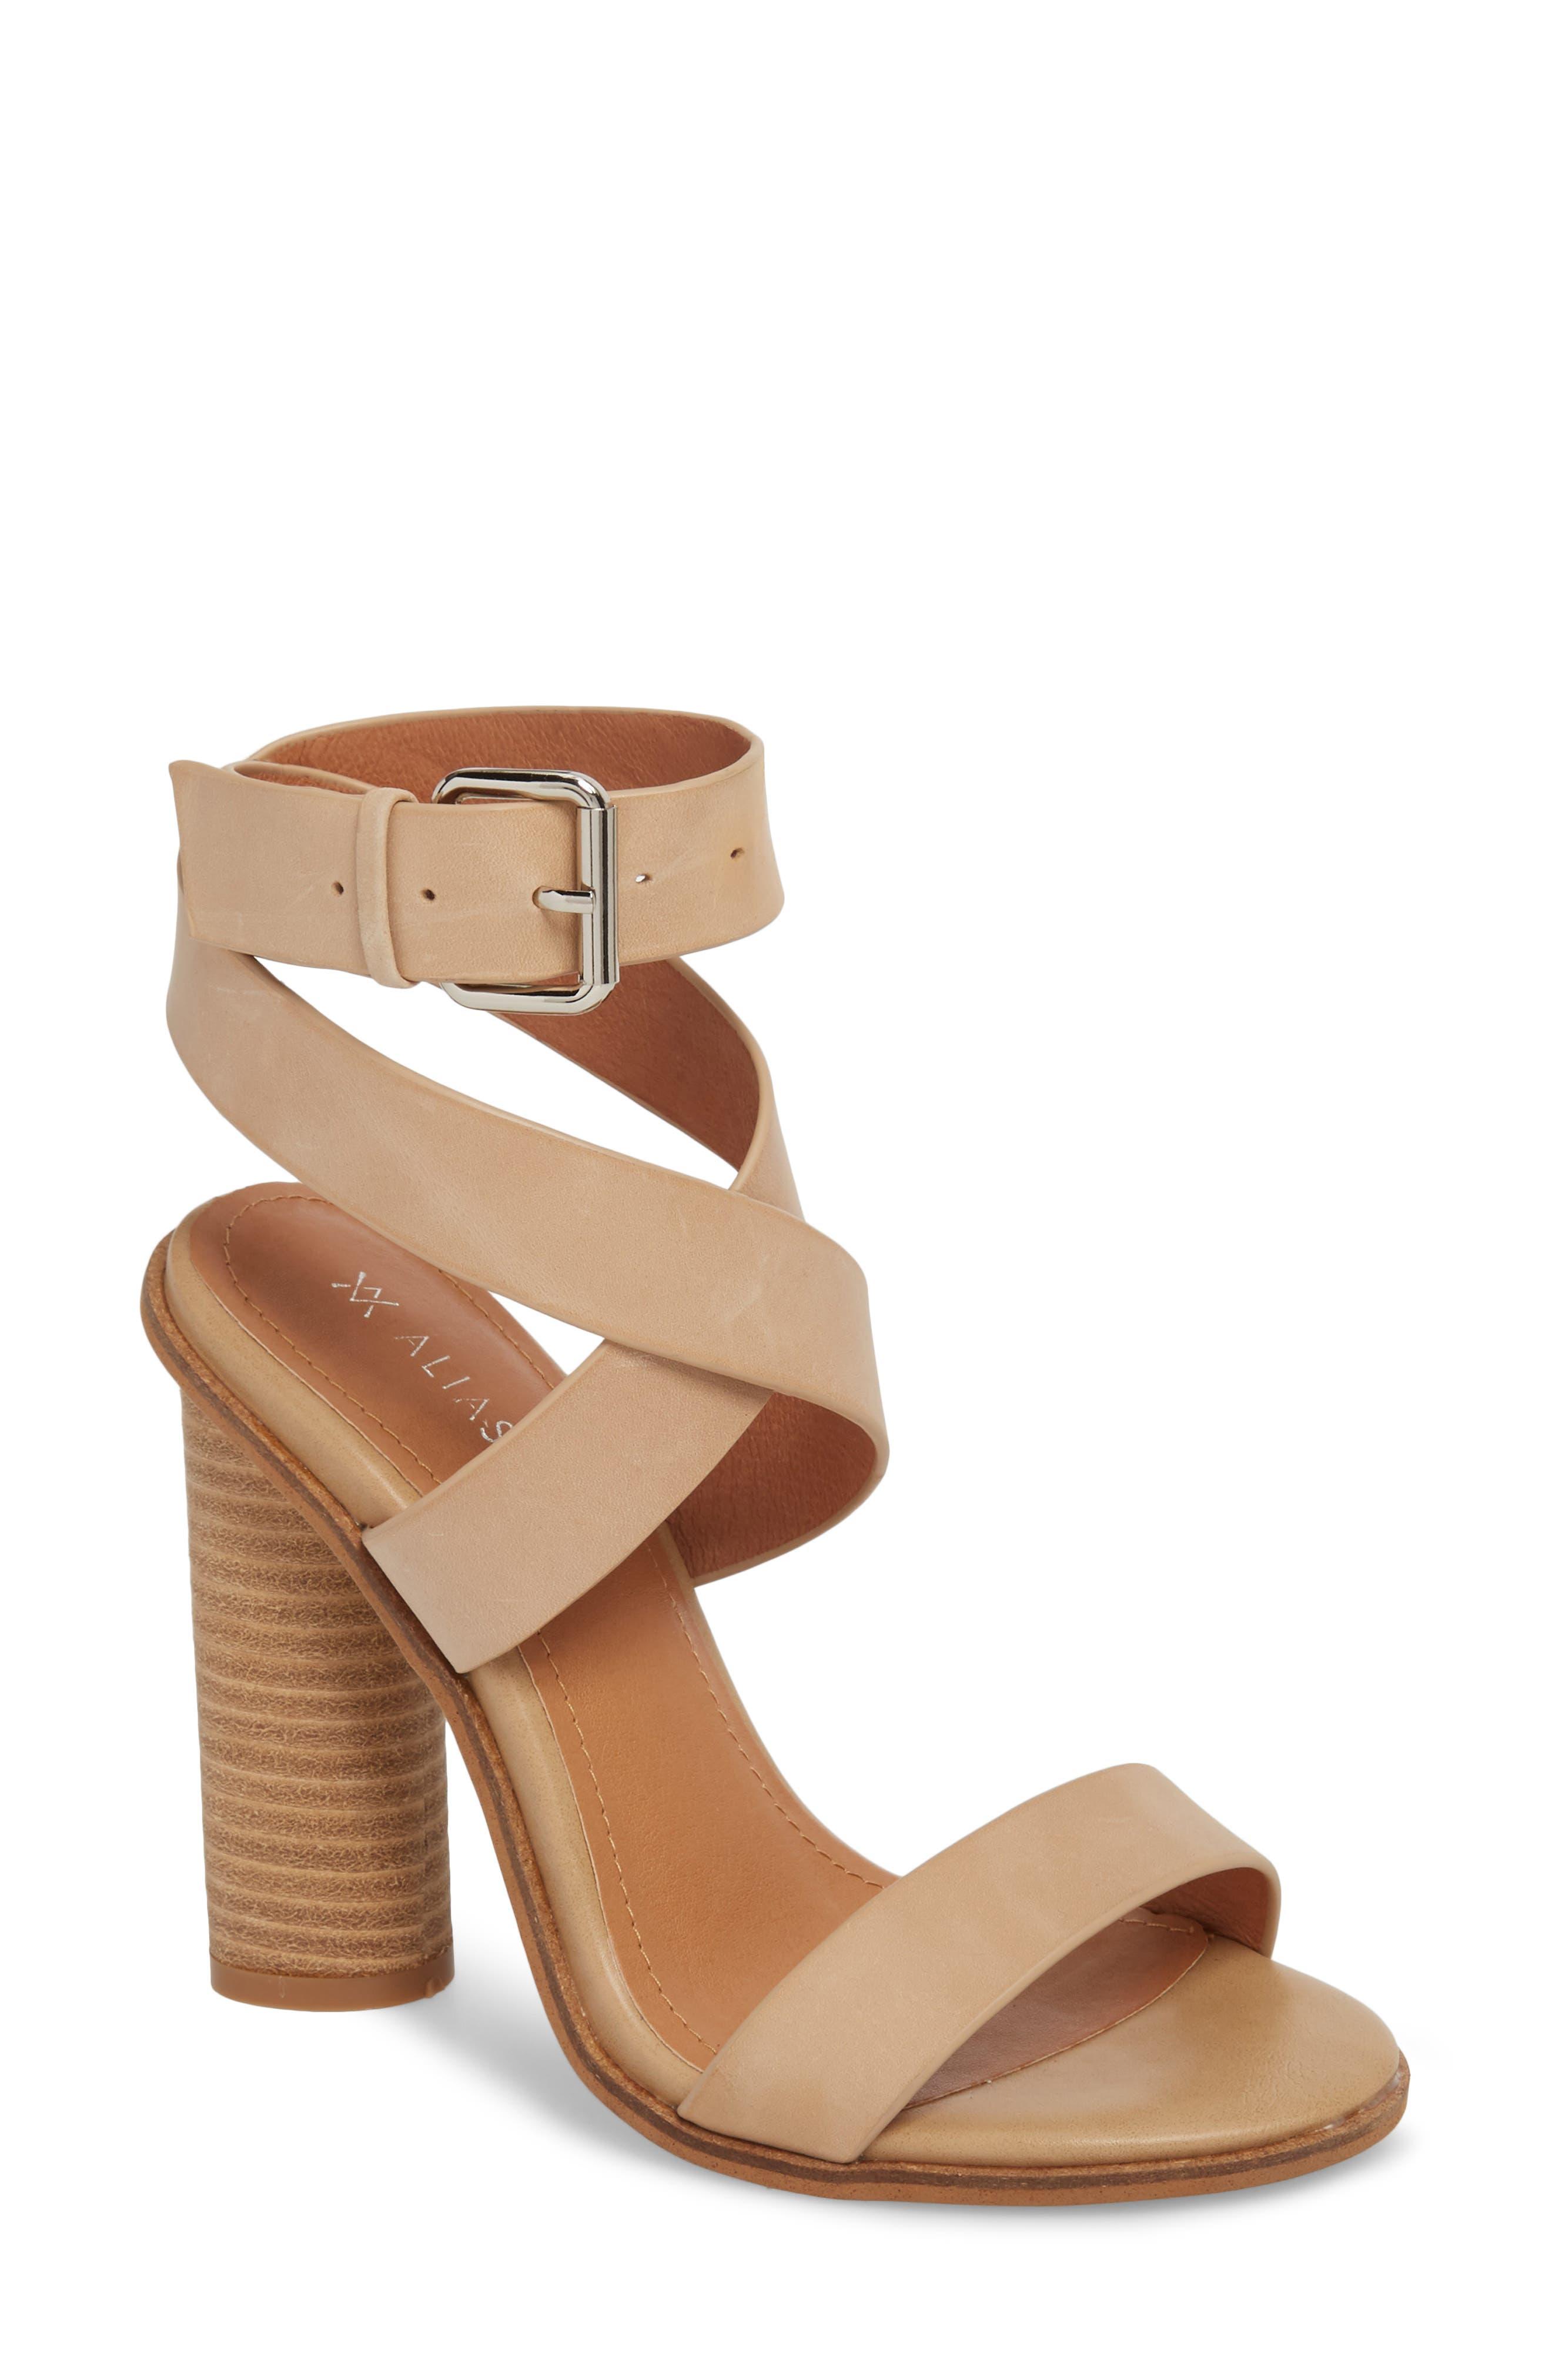 Abaala Cross Strap Sandal,                         Main,                         color, Natural Leather